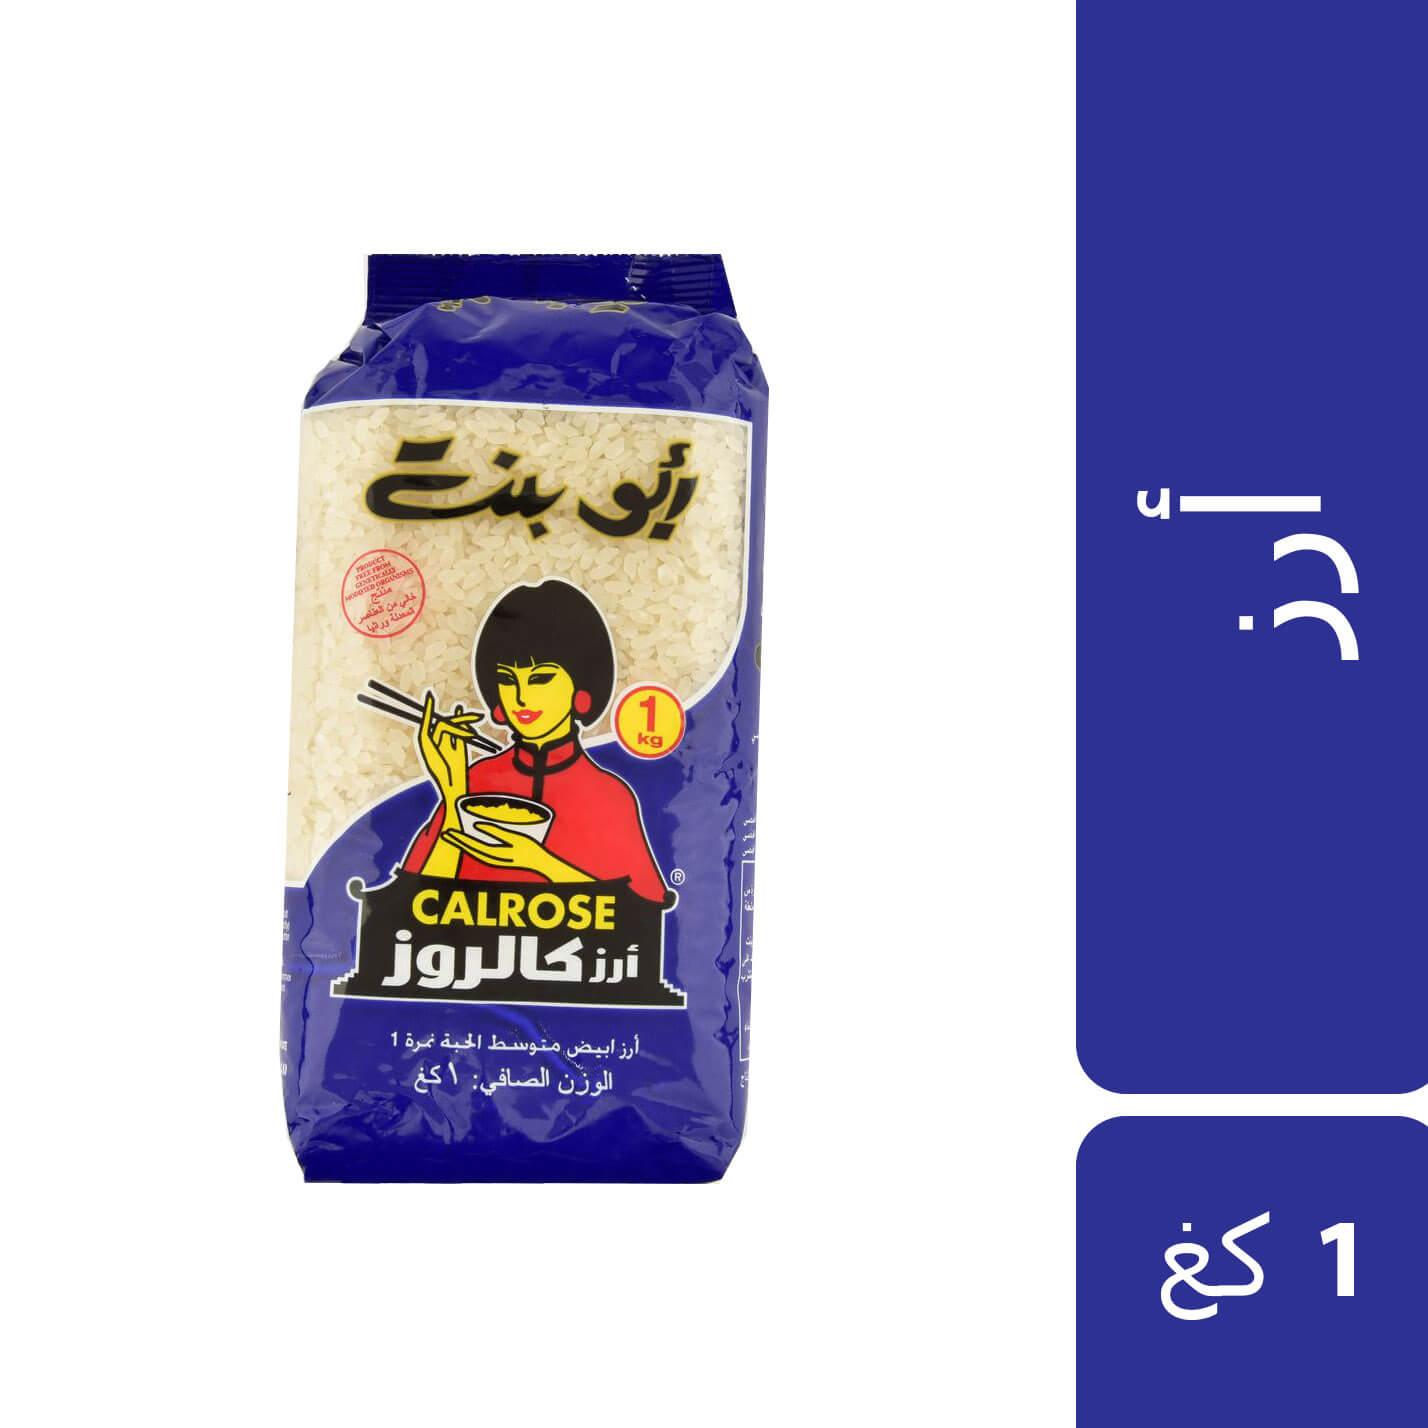 Abu Bint Clarose Rice Medium Grain, 1 Kg